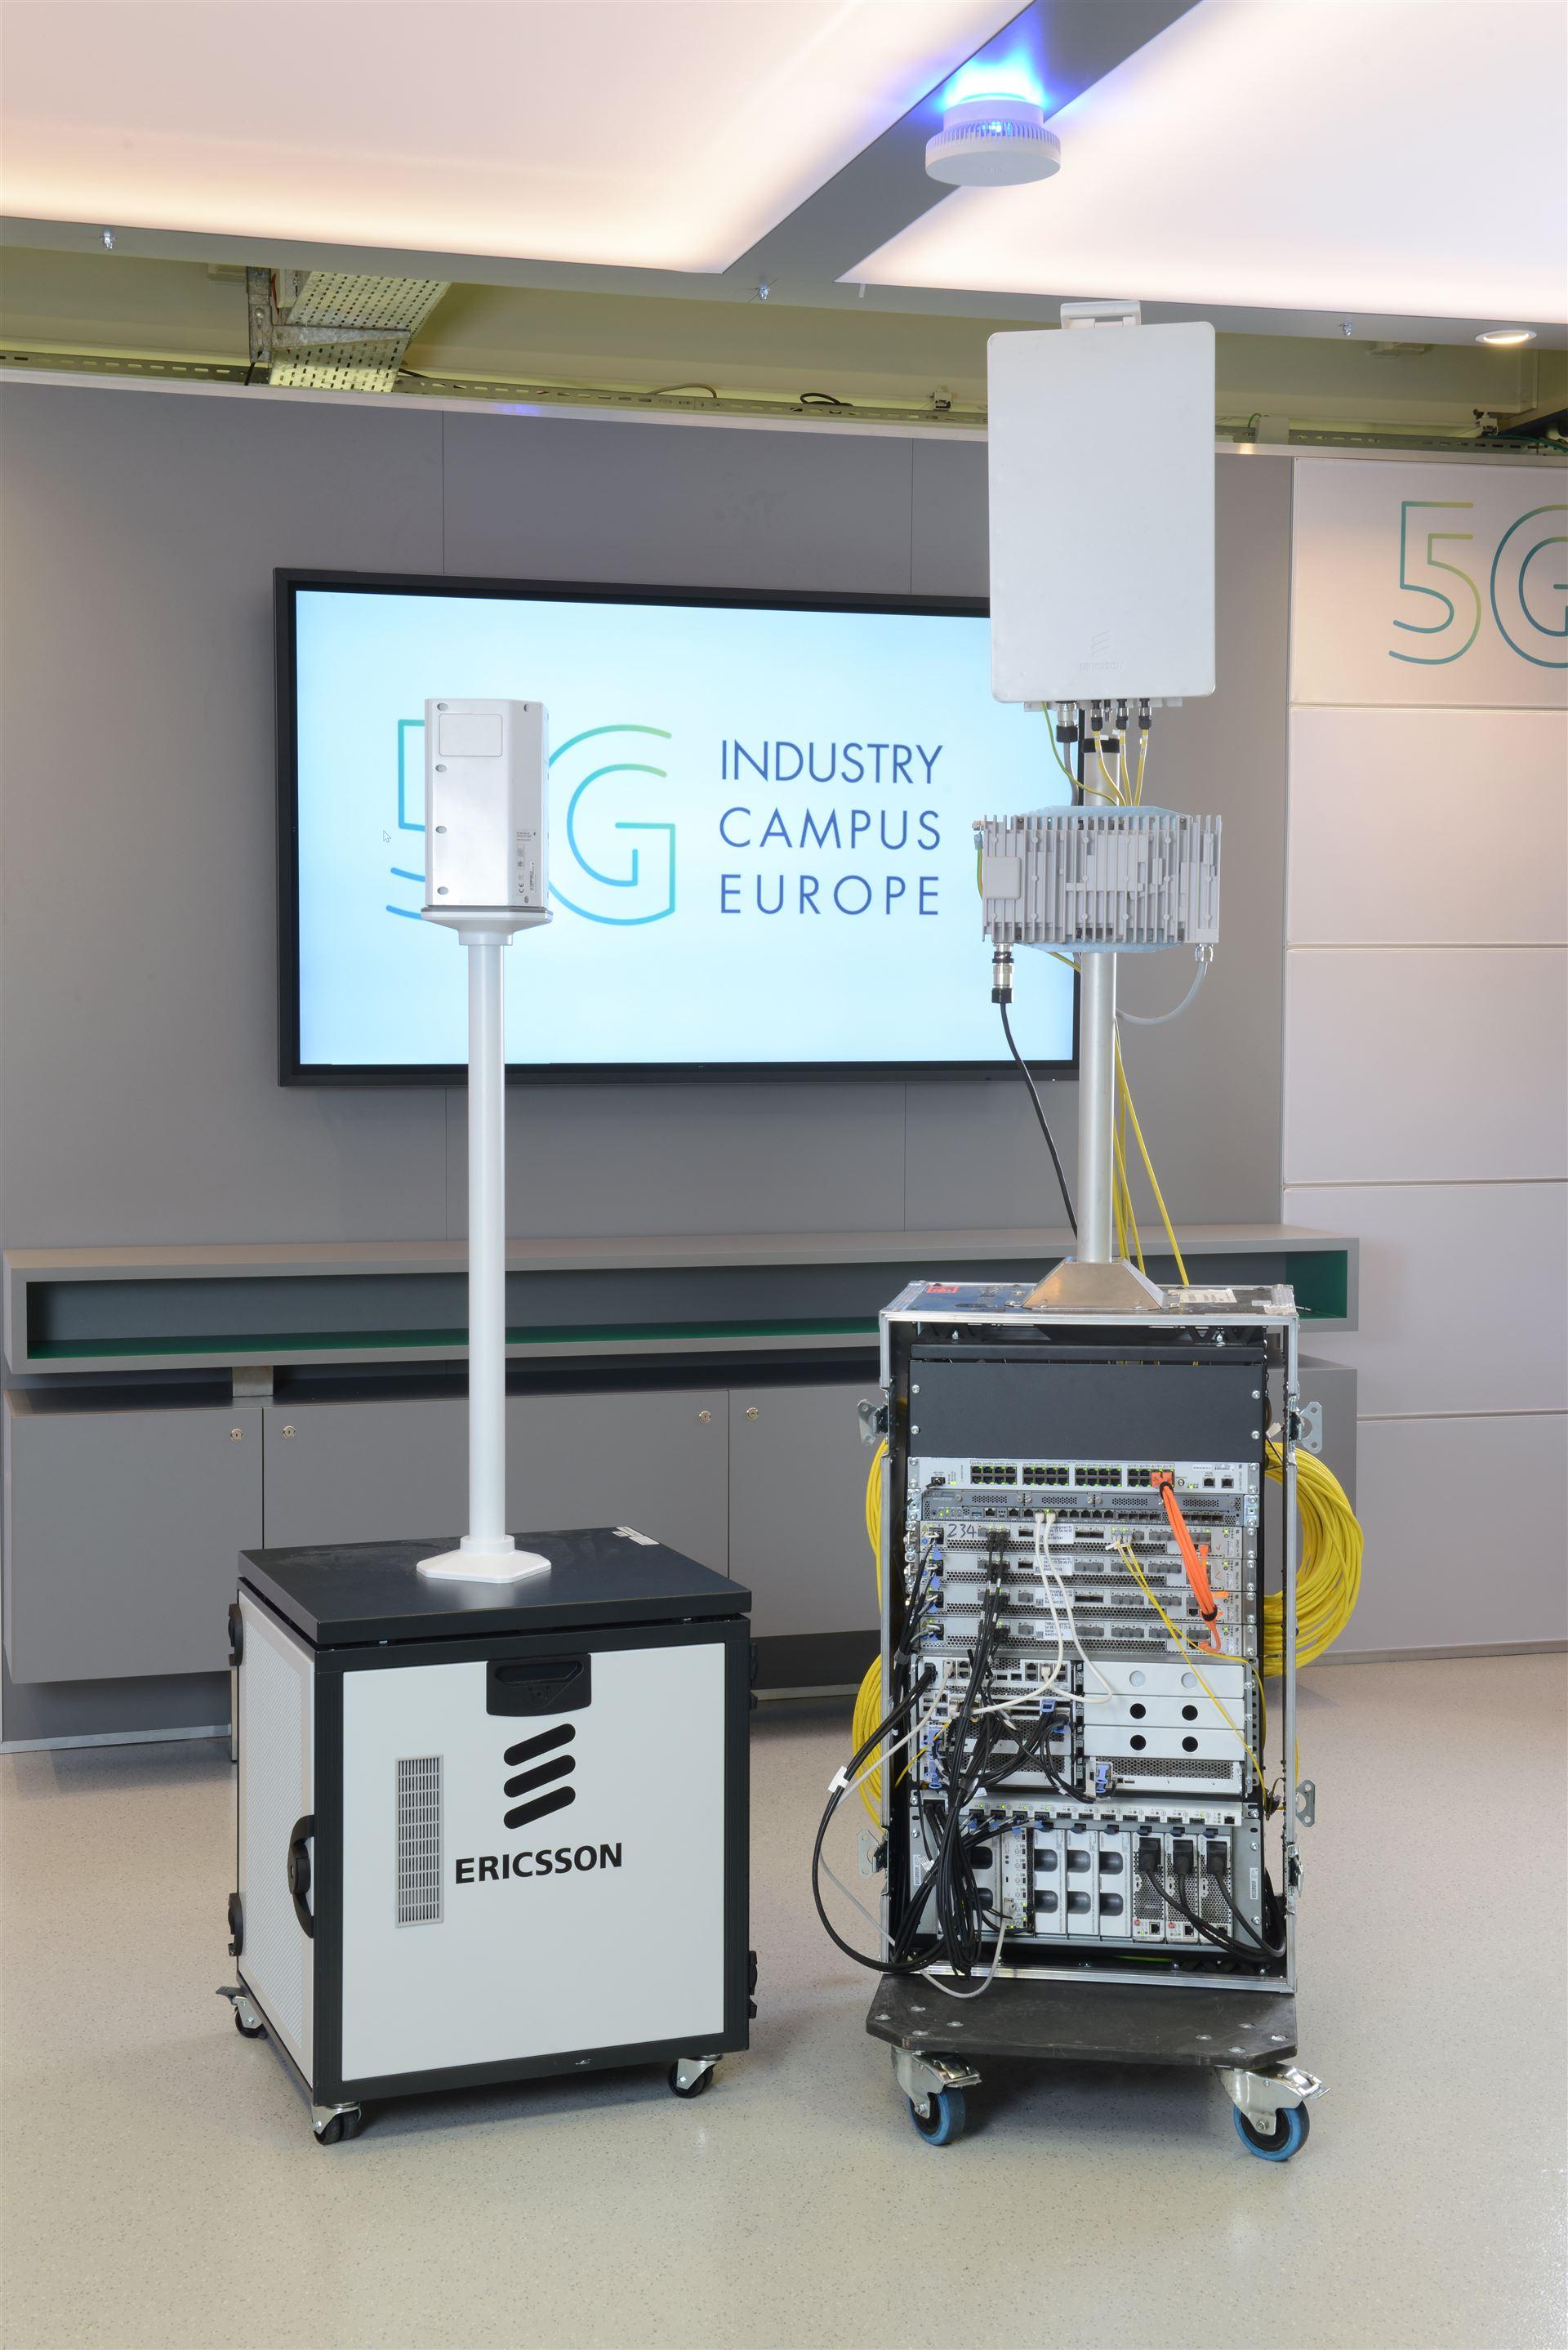 5G-Millimeter-Wave-Testbed, 26 GHz